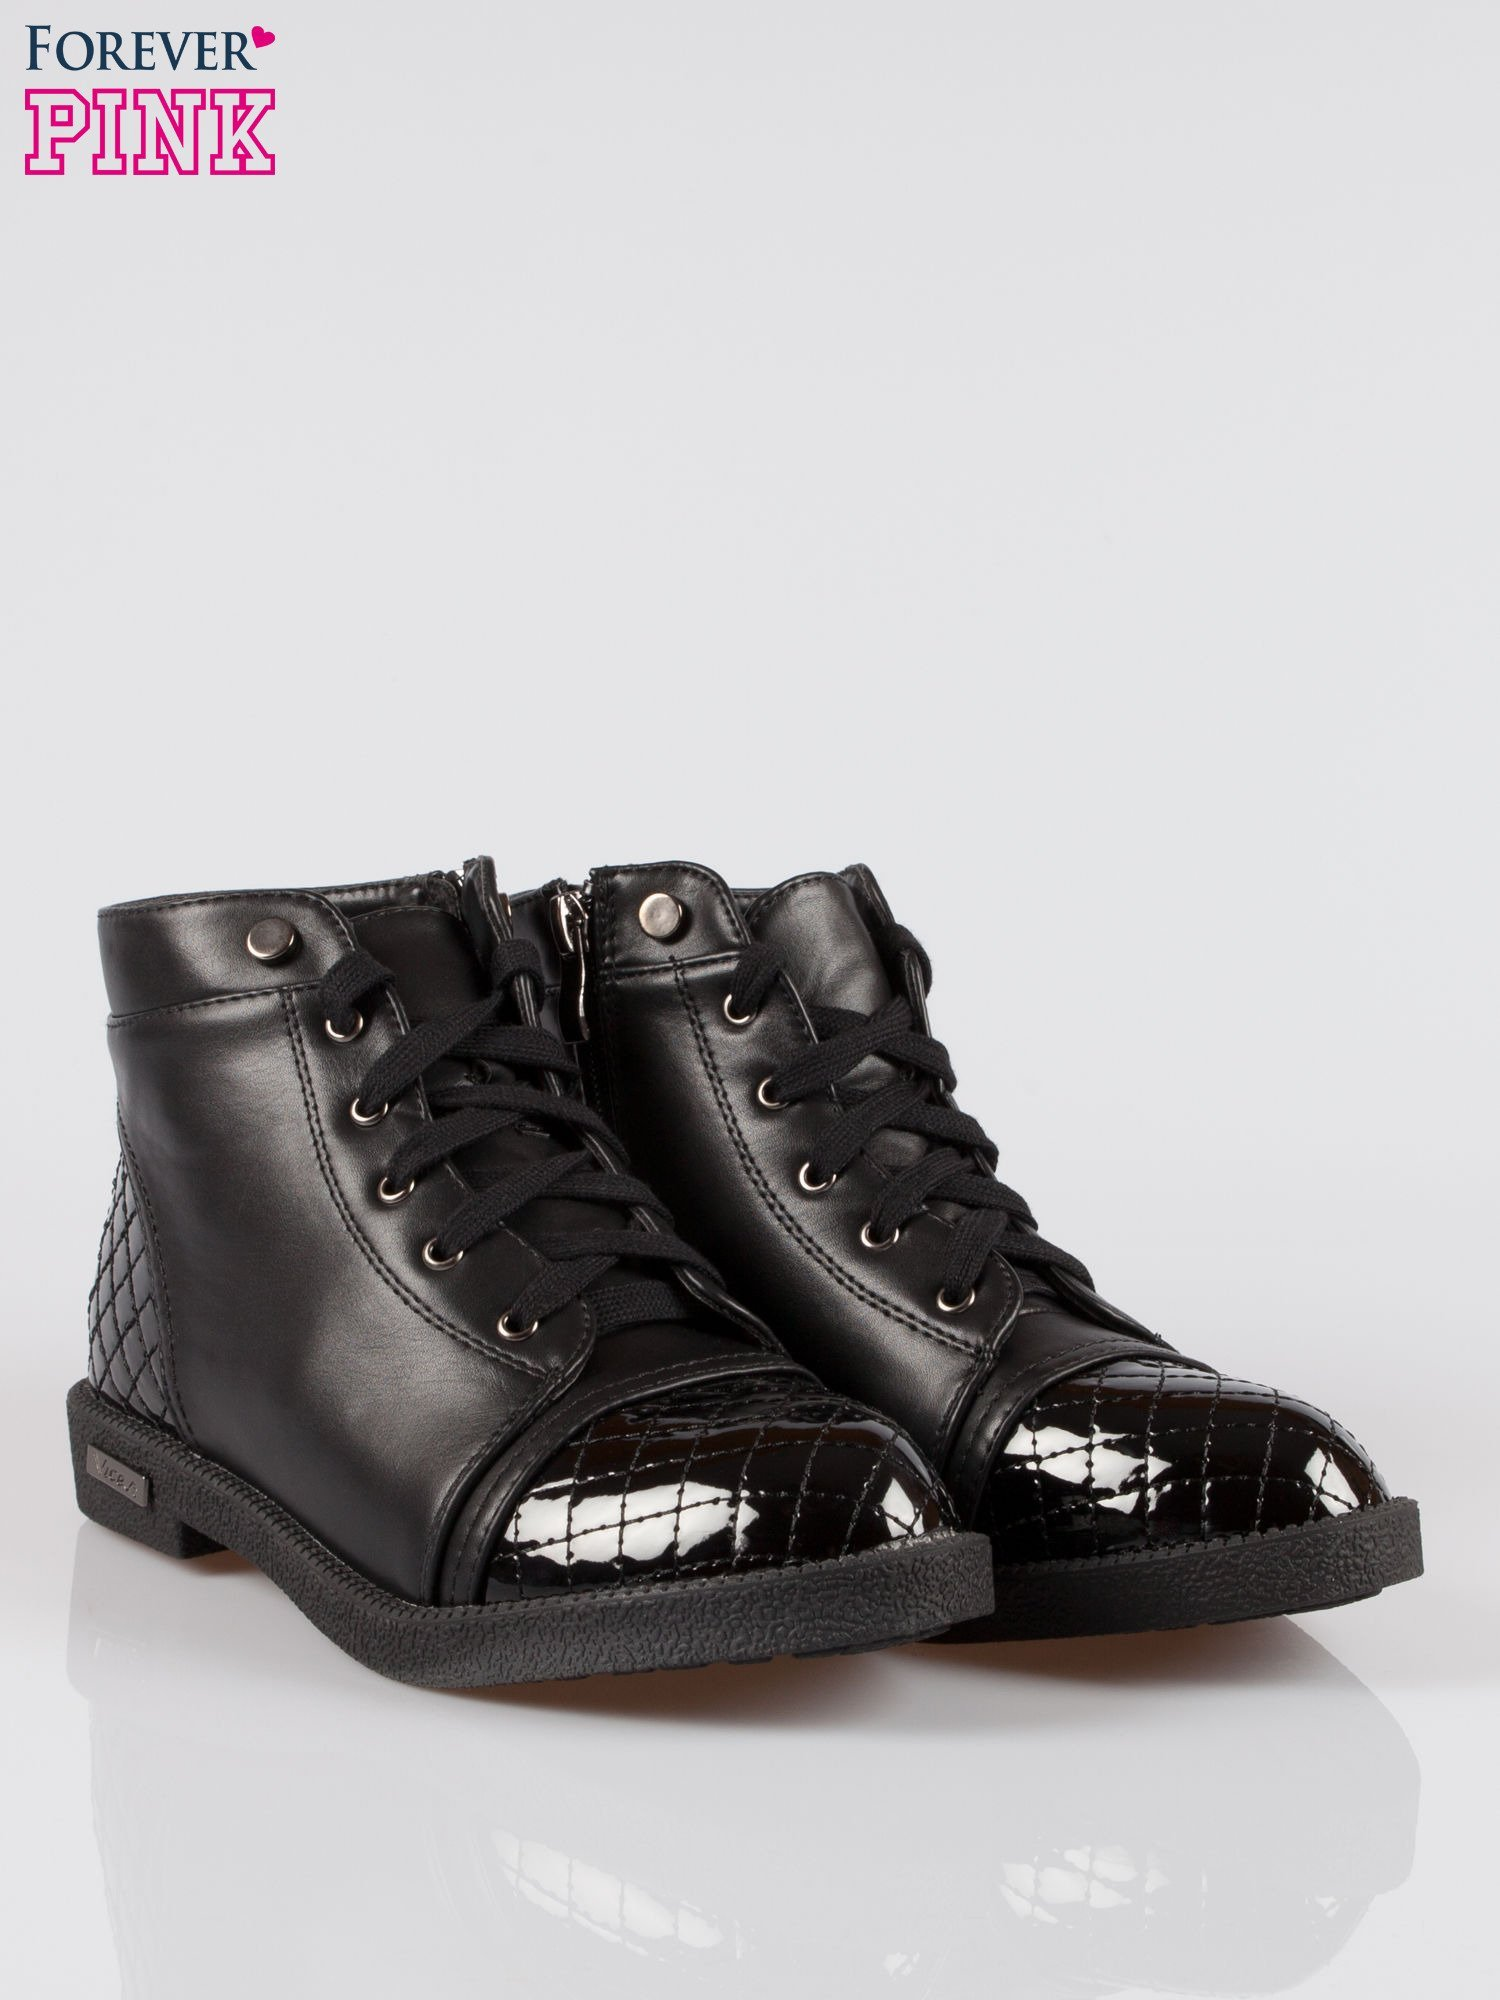 Czarne sznurowane botki damskie crocodile skin cap toe                                  zdj.                                  2